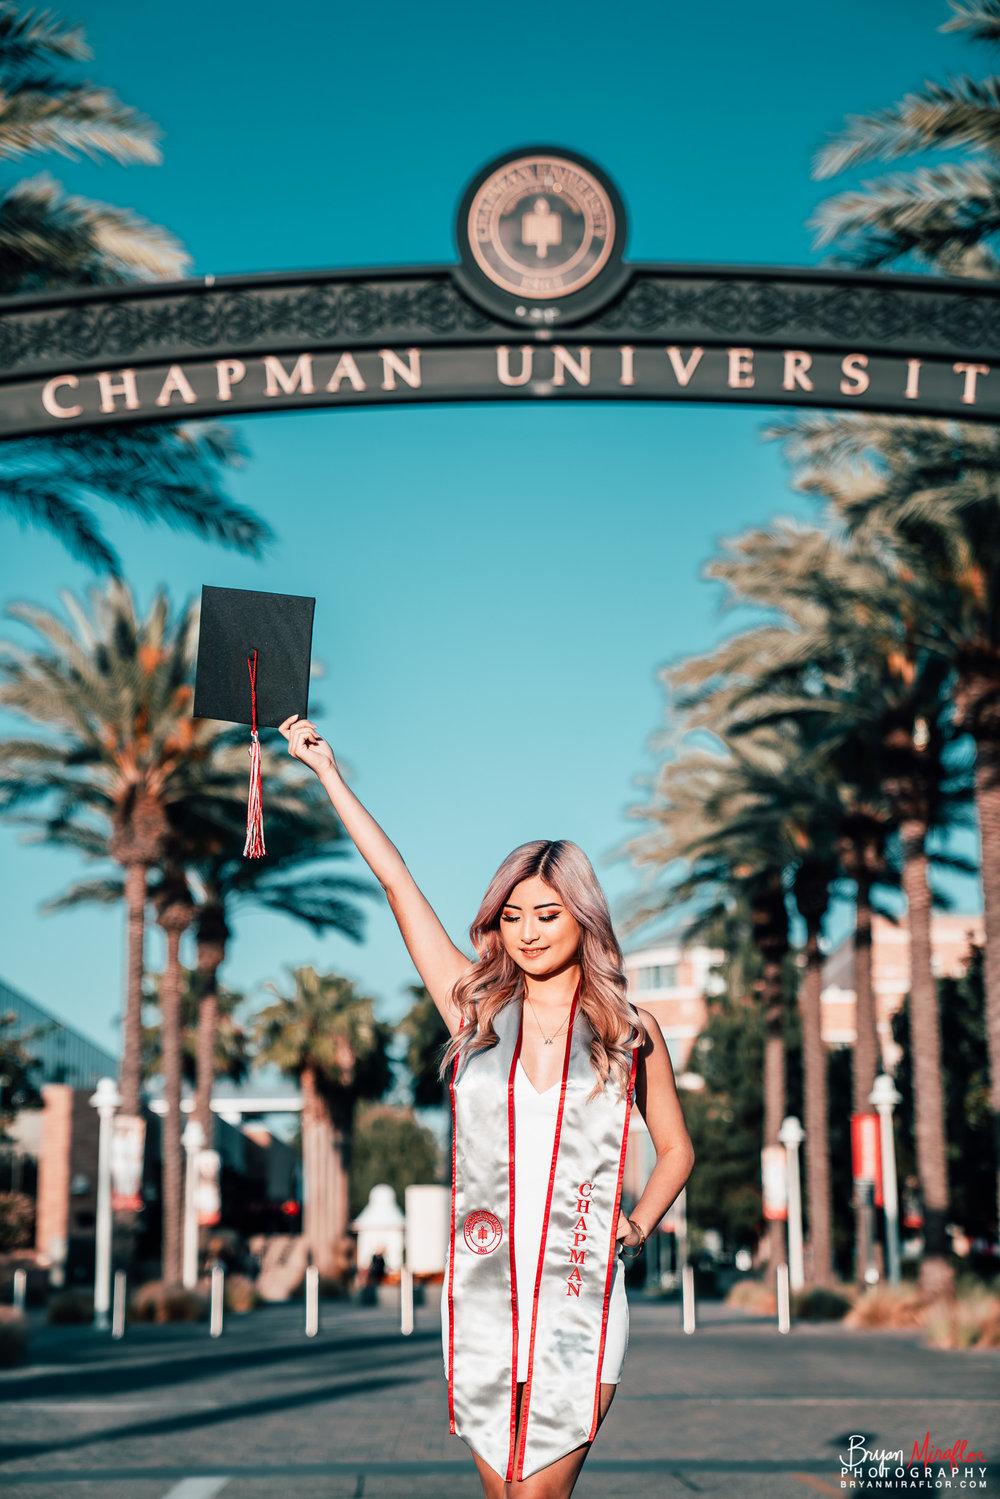 Bryan-Miraflor-Photography-Sandra-Chapman-University-Grad-Photoshoot-20180427-353-Edit.JPG